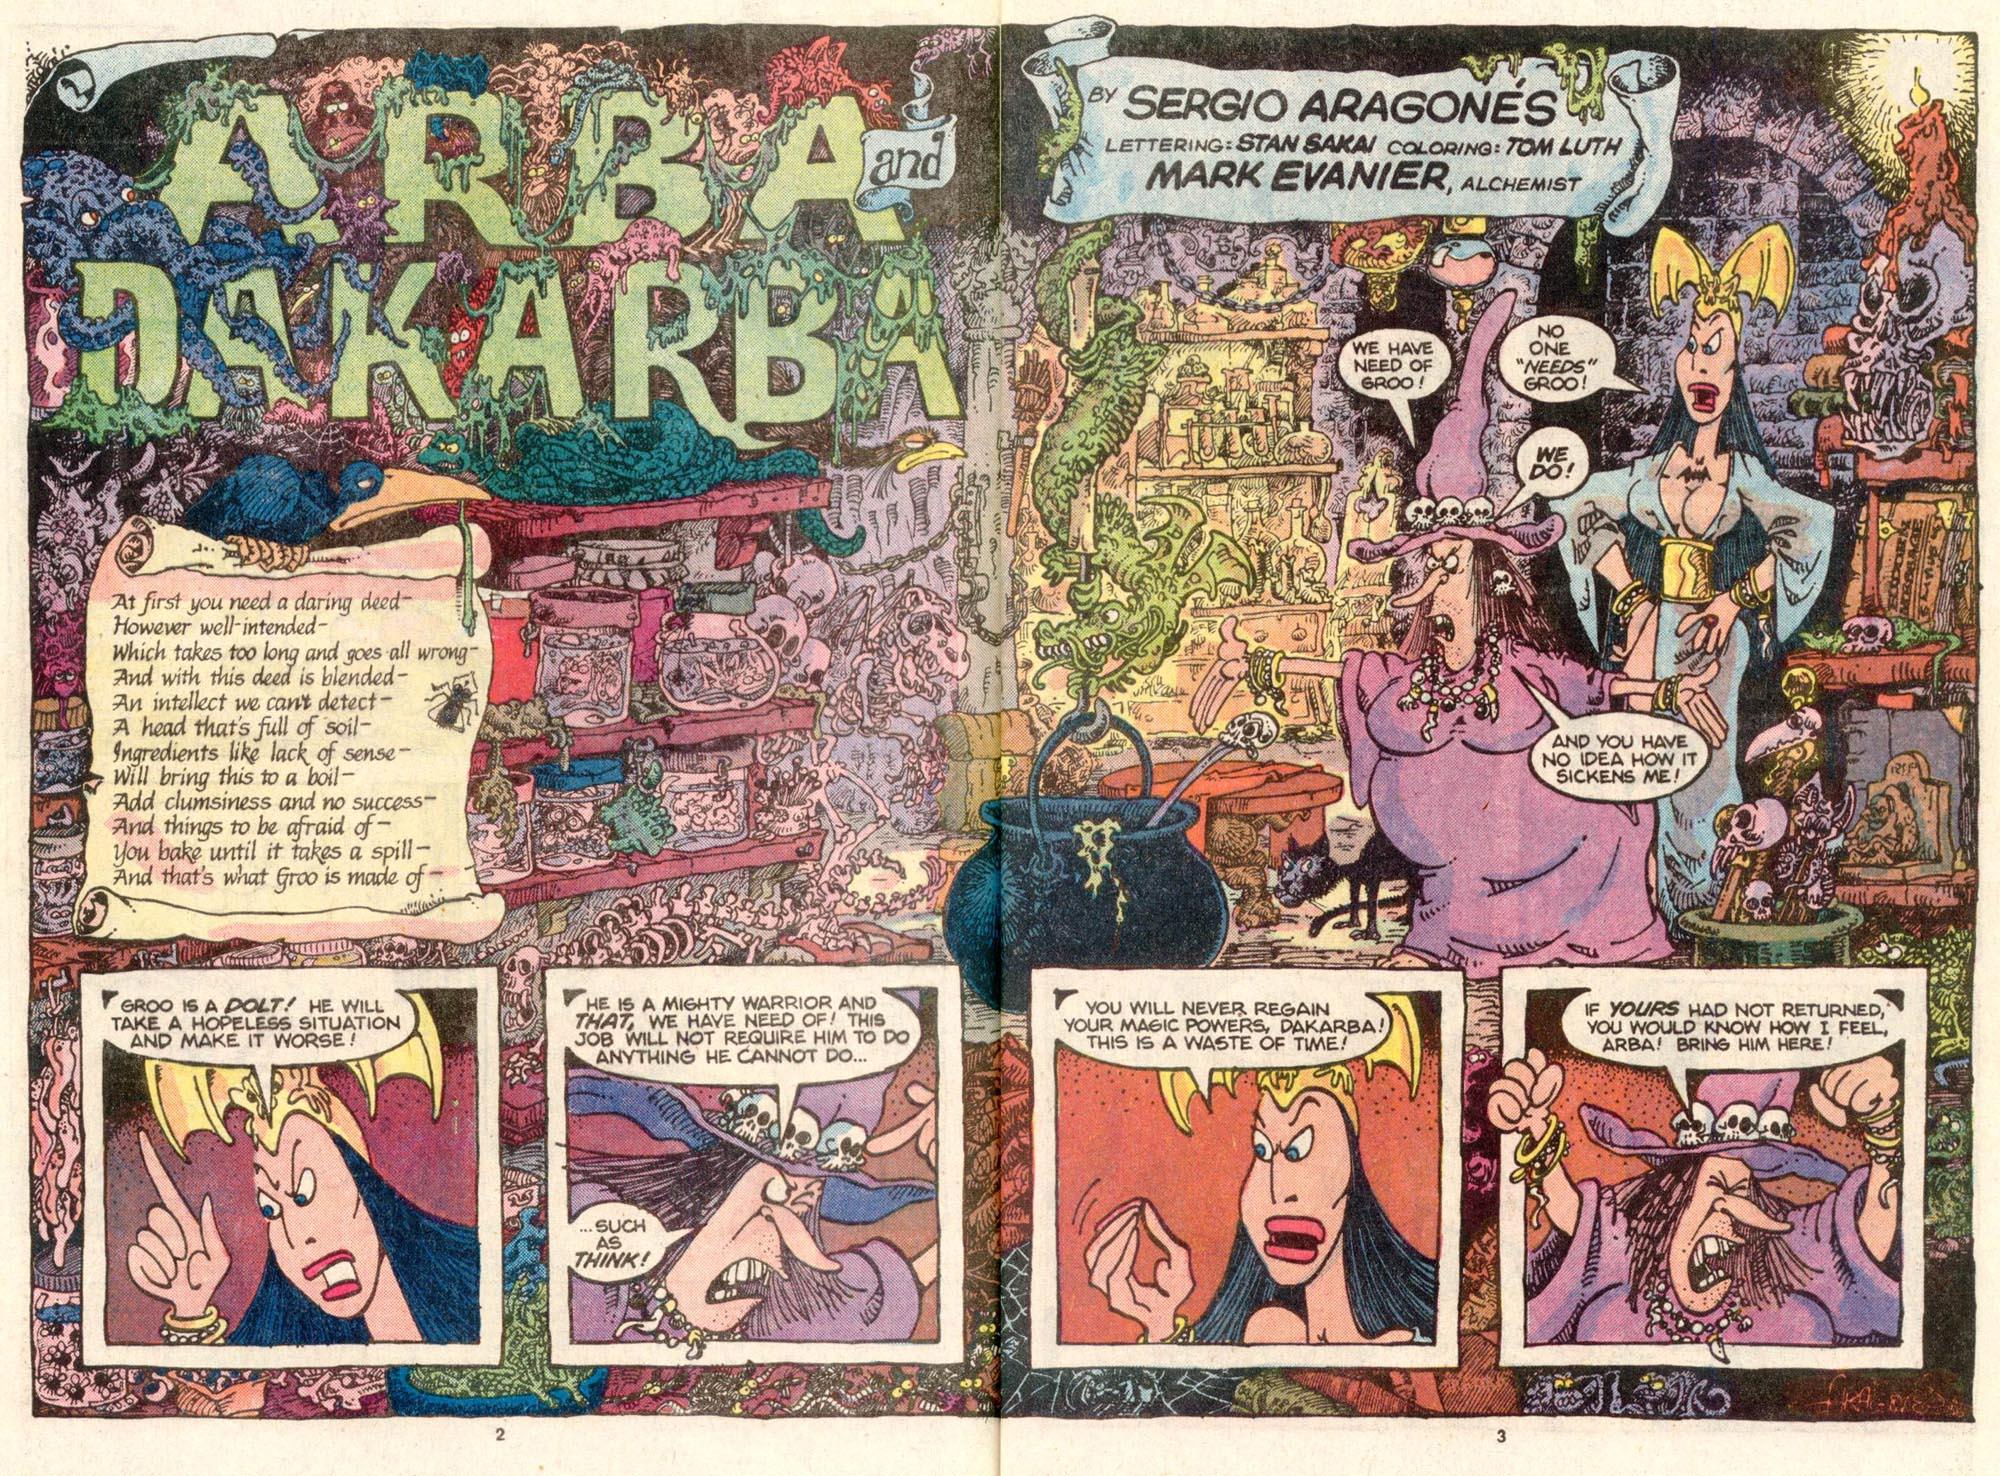 Read online Sergio Aragonés Groo the Wanderer comic -  Issue #26 - 3